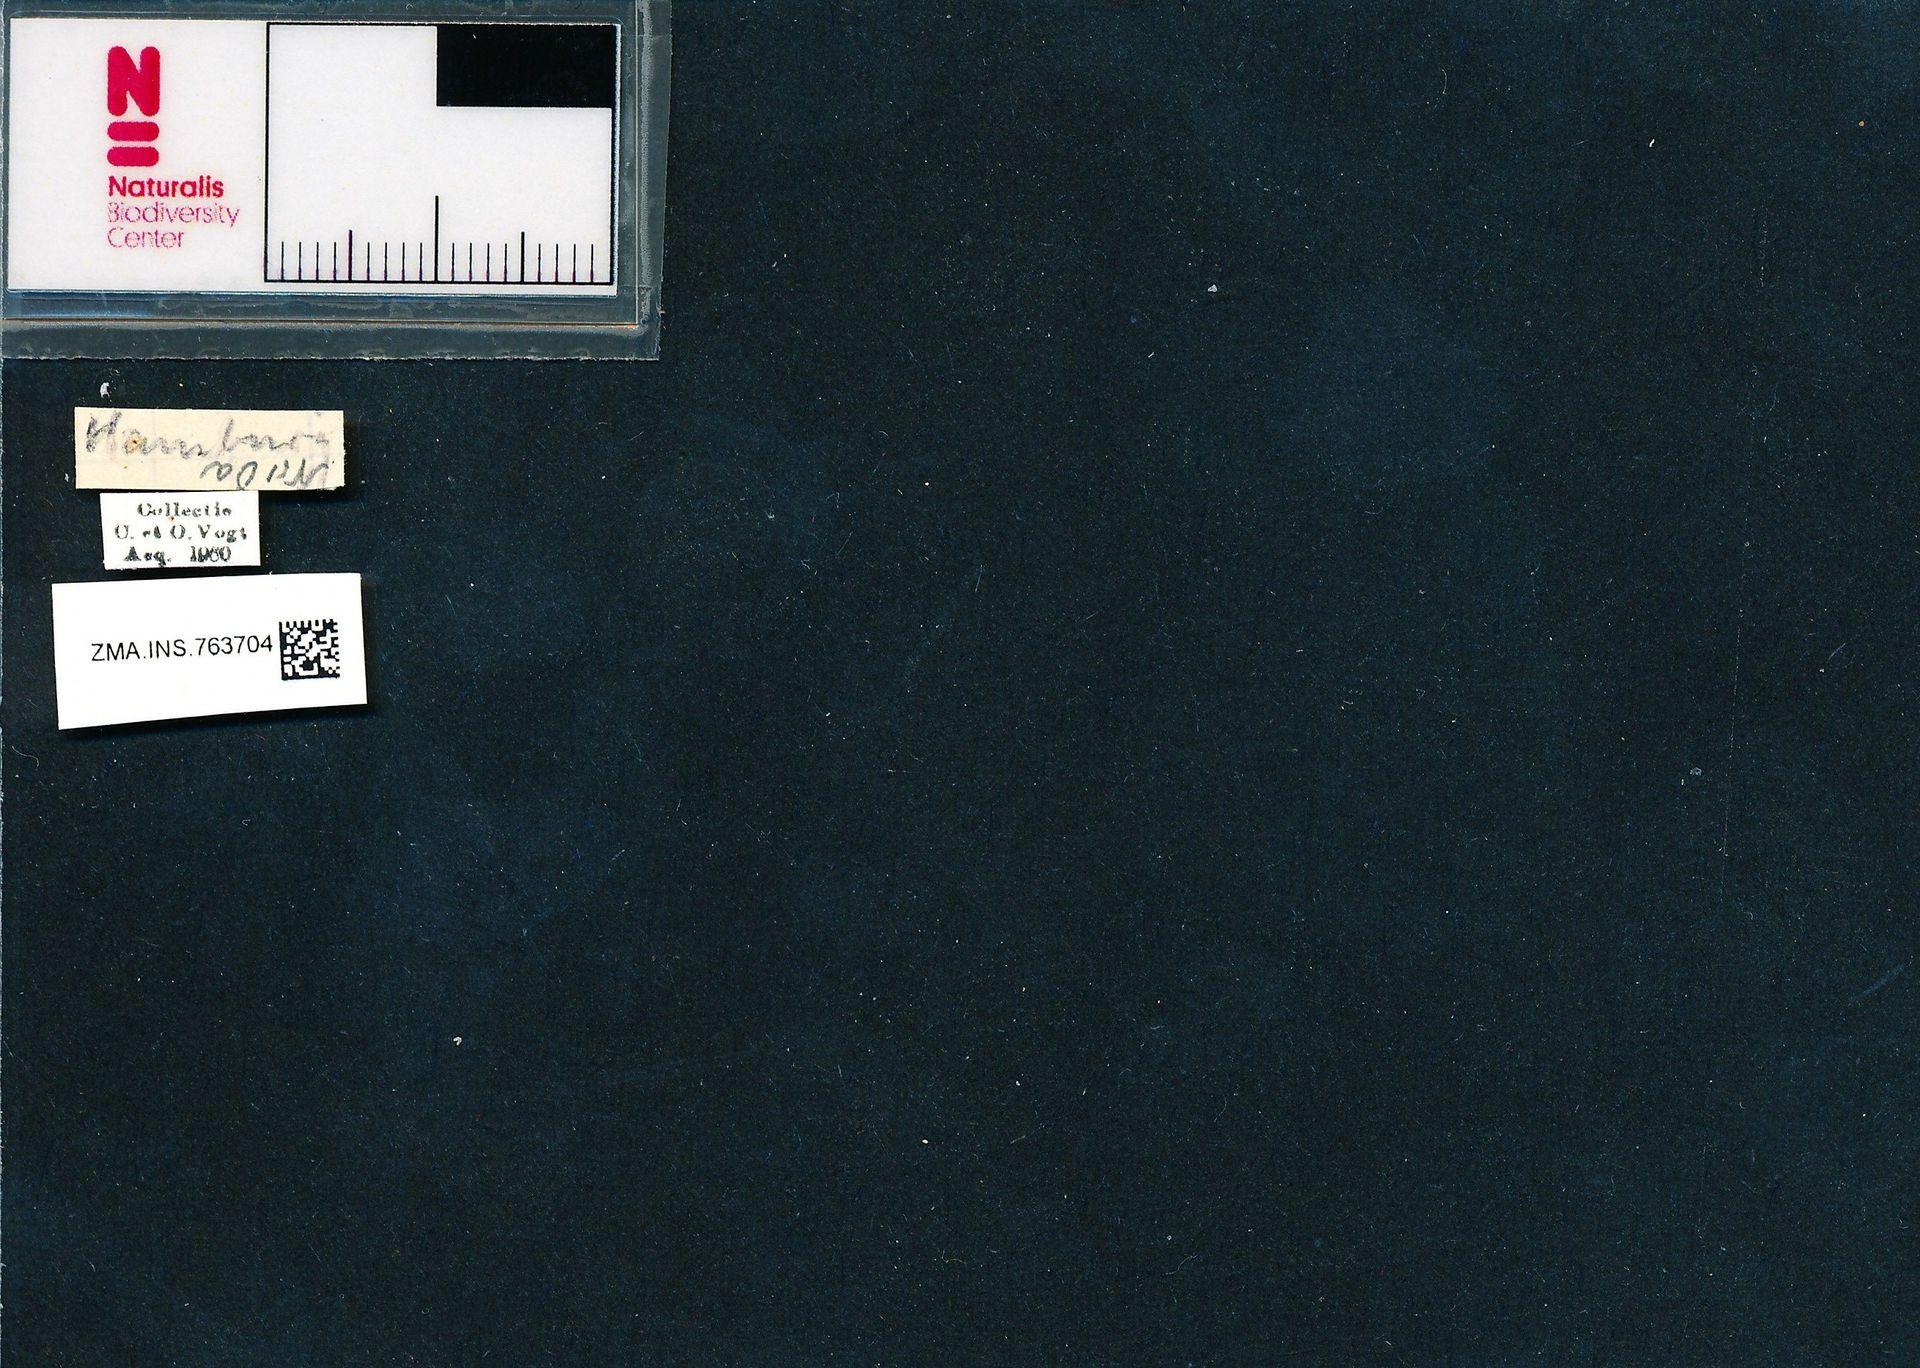 ZMA.INS.763704 | Bombus (Pyrobombus) pratorum pratorum (Linnaeus, 1761)